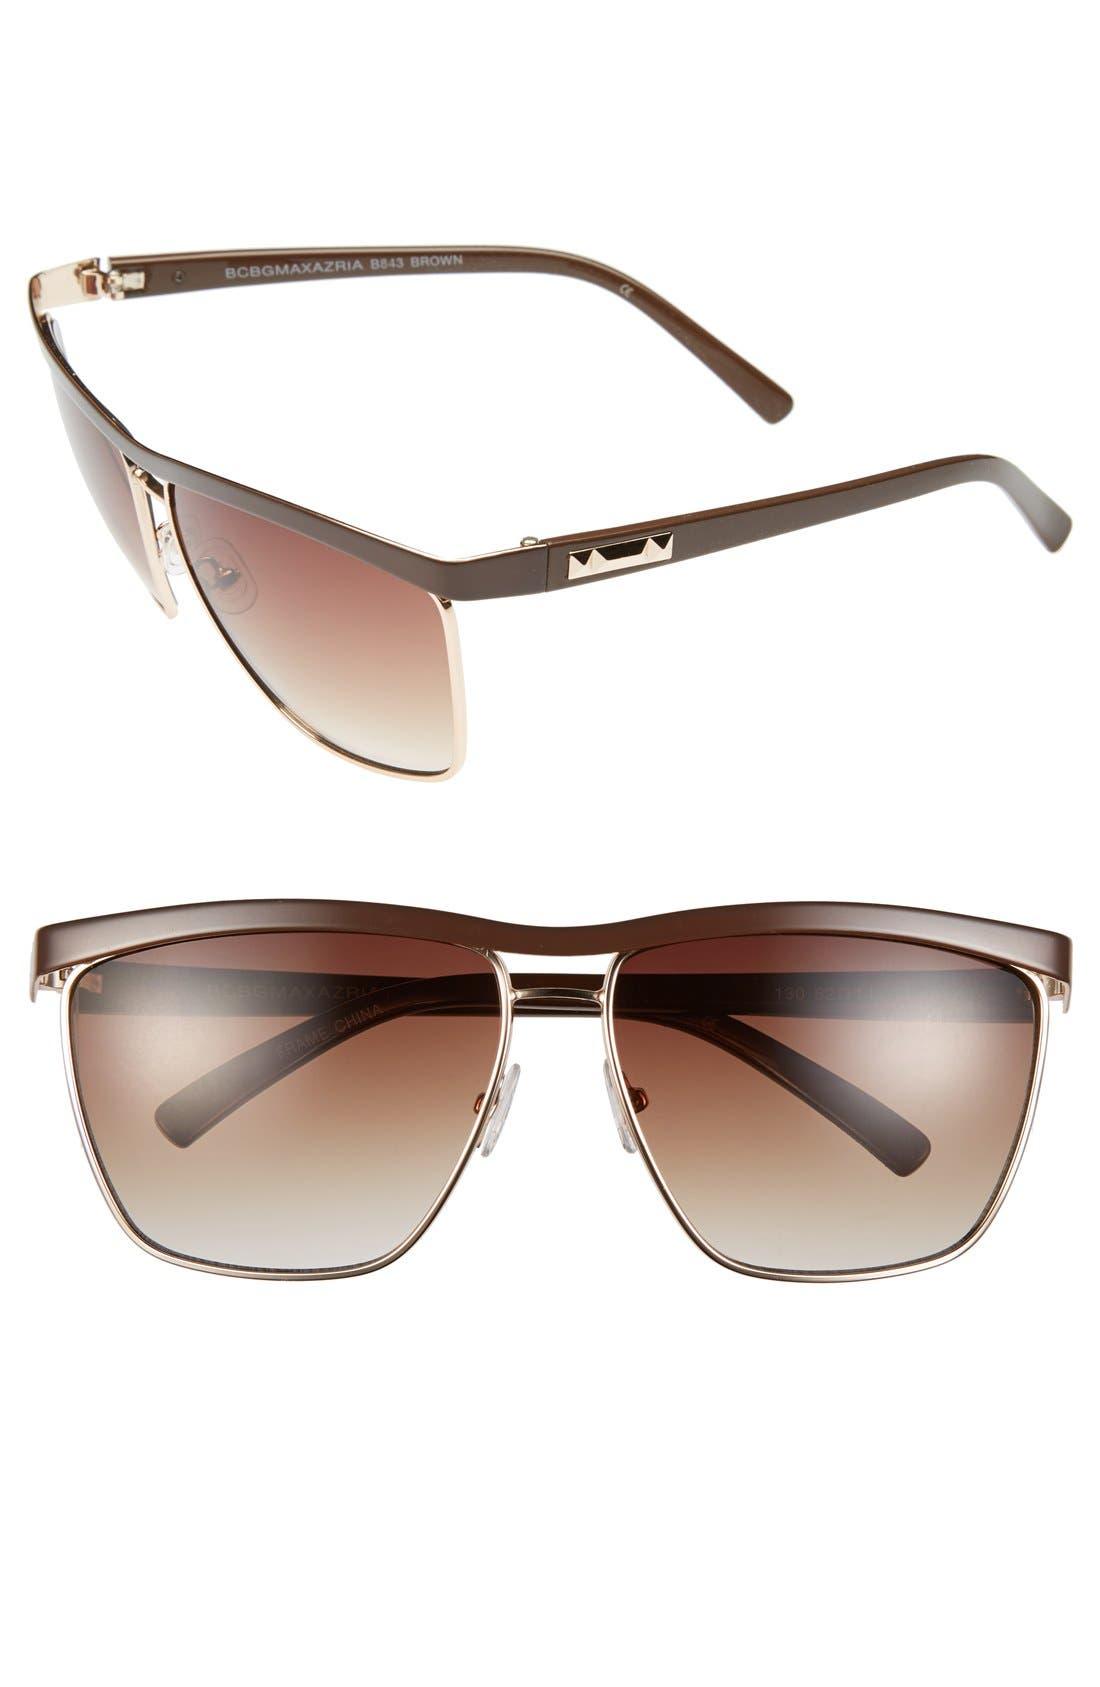 Alternate Image 1 Selected - BCBGMAXAZRIA 62mm Sunglasses